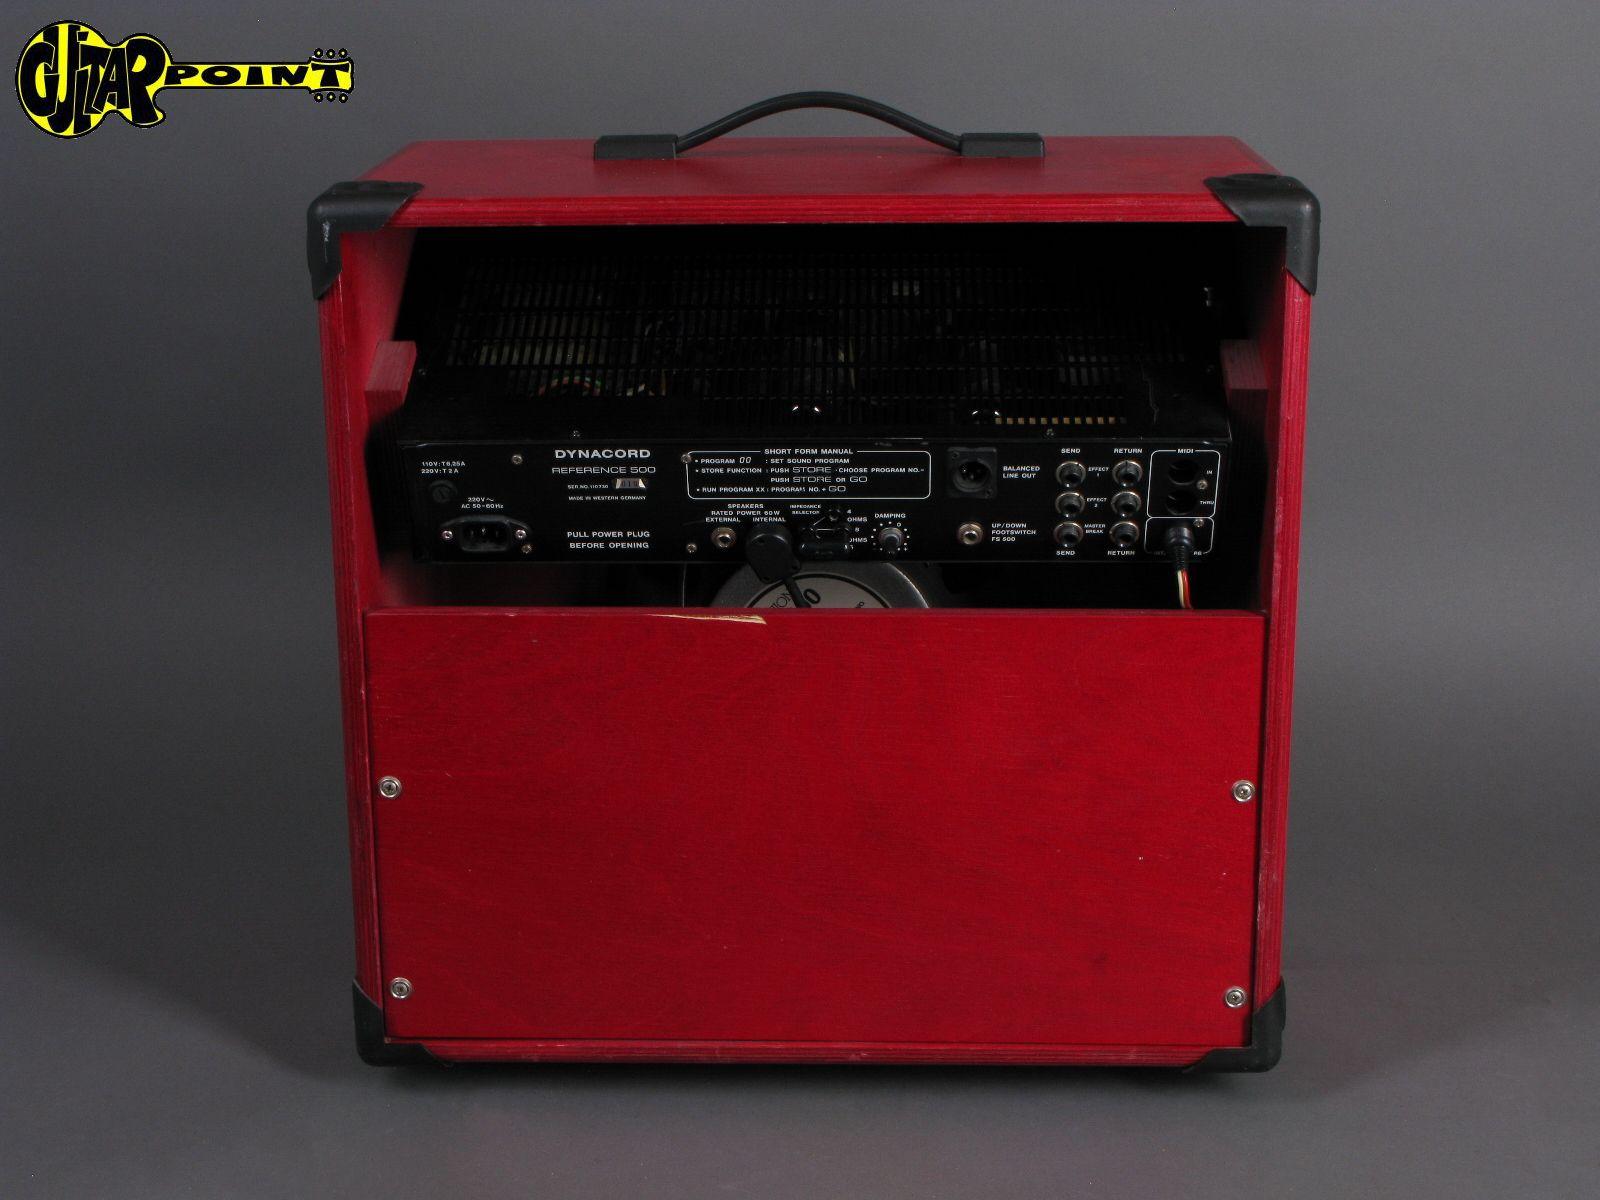 dynacord reference 500 65 watt tube amp 1985 red amp for sale guitarpoint. Black Bedroom Furniture Sets. Home Design Ideas